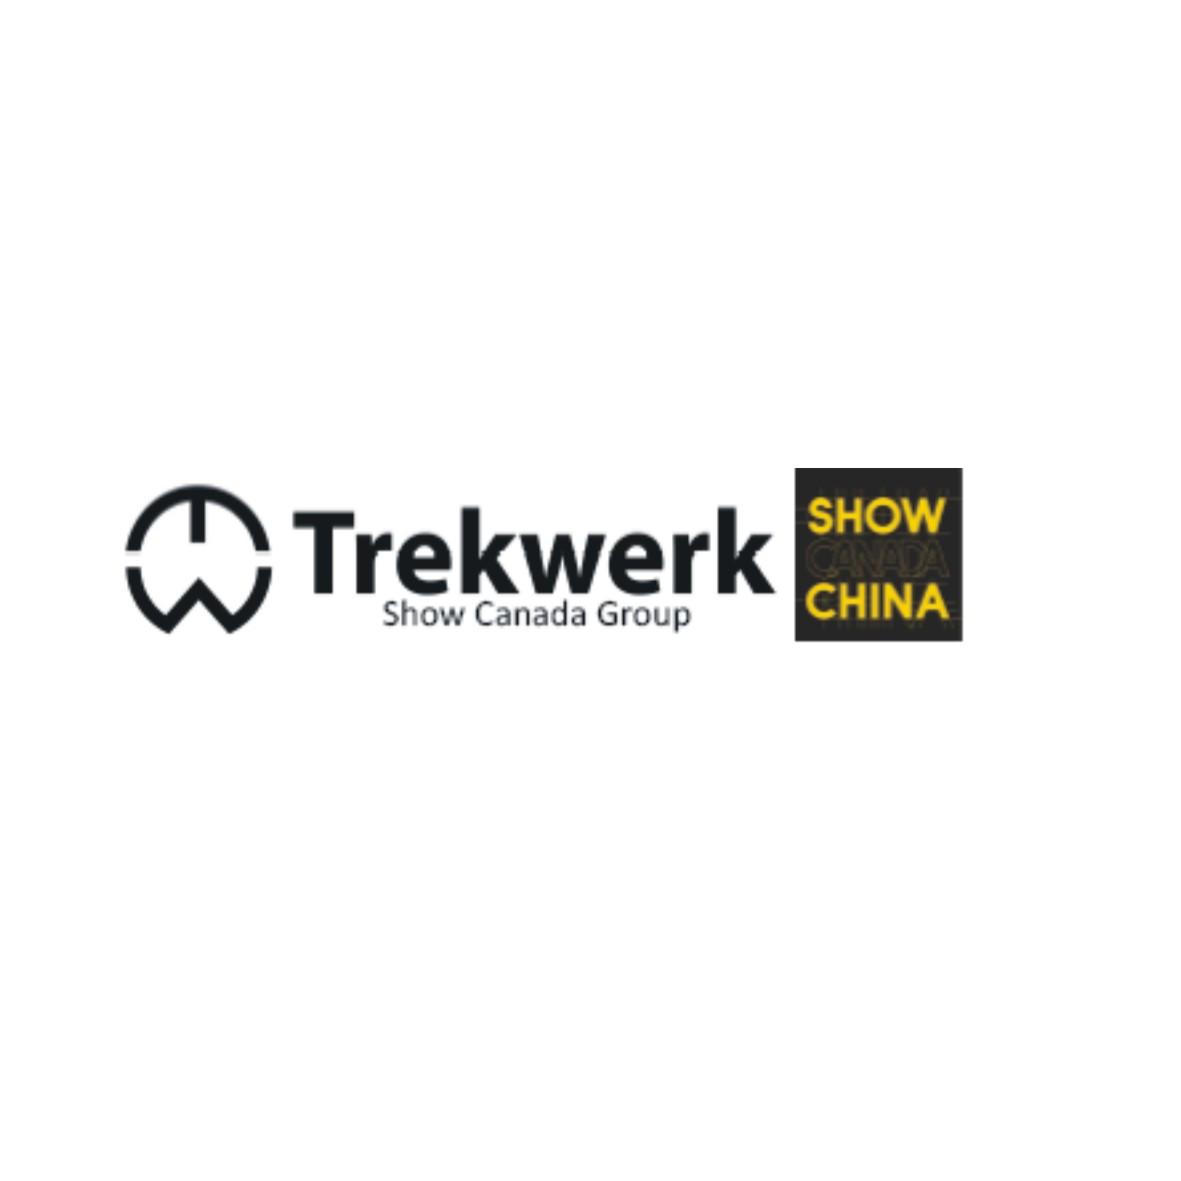 Trekwerk 近年主要剧场业绩